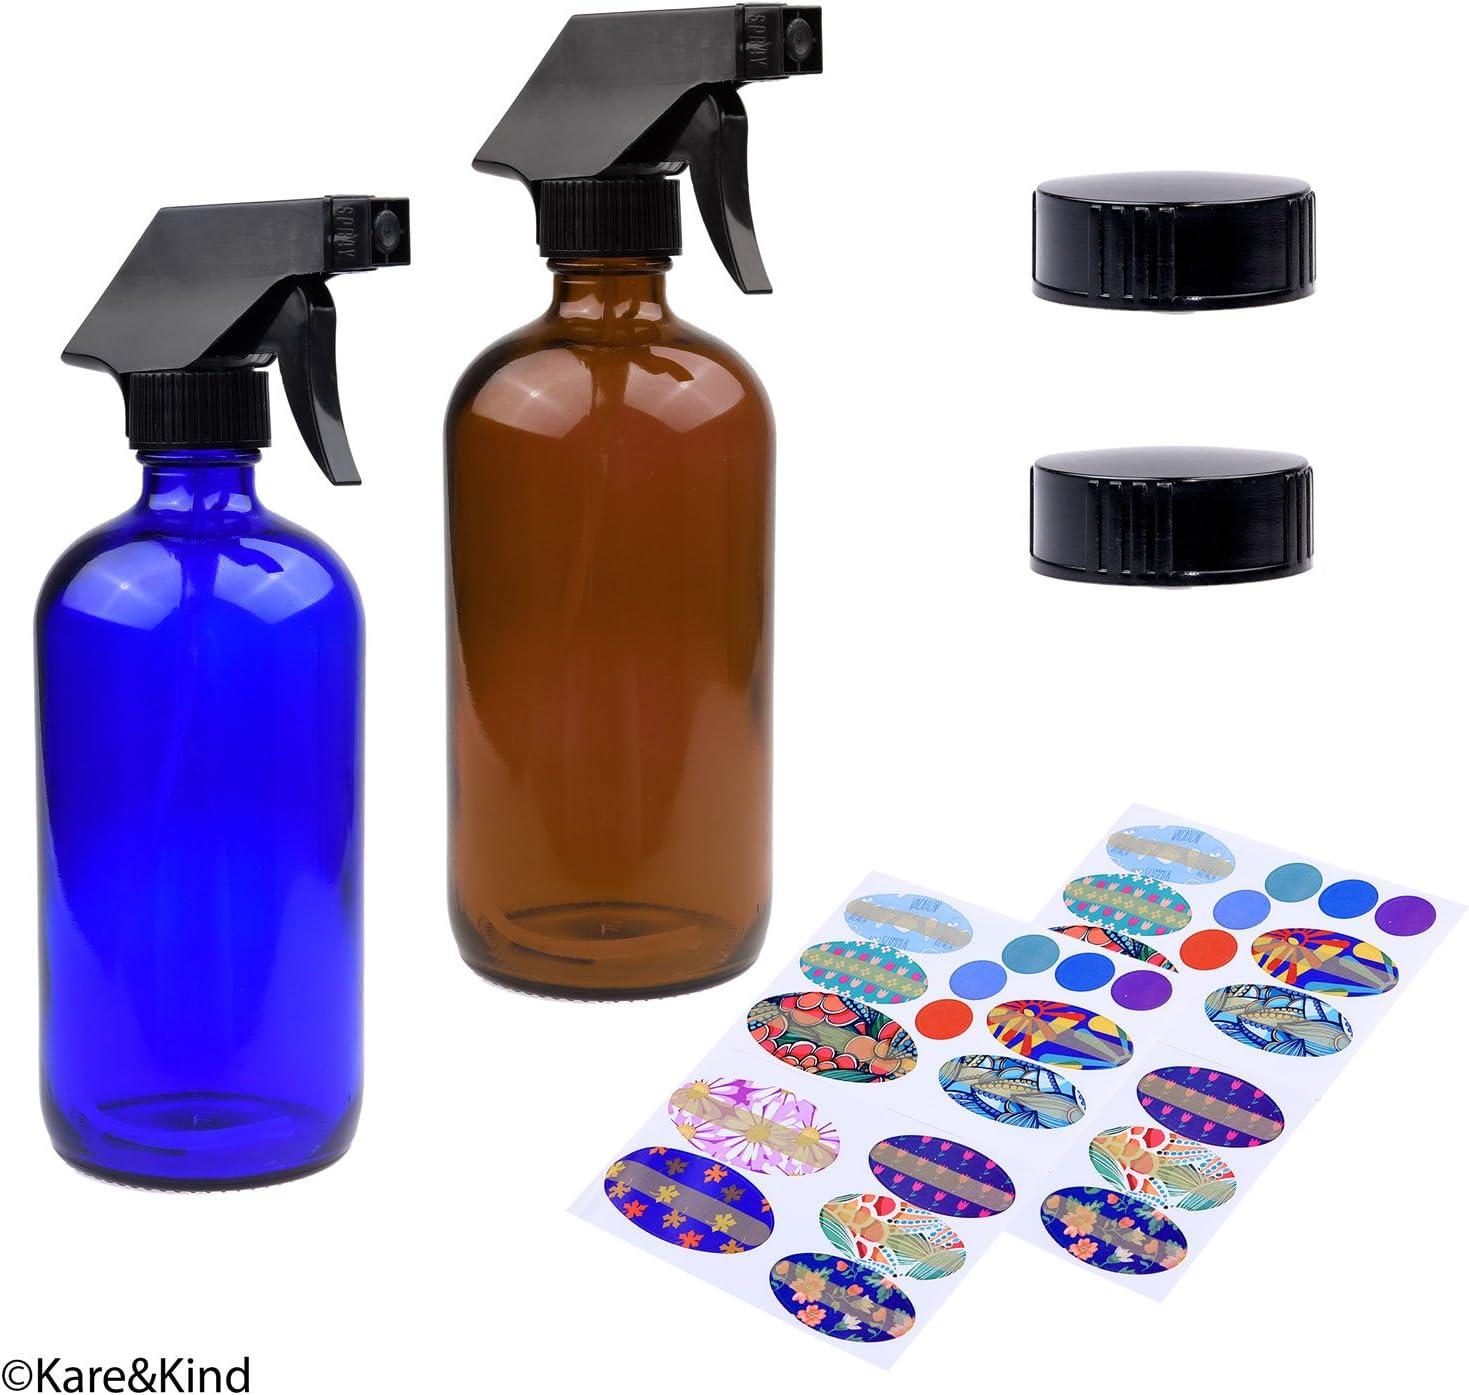 2 Botellas de aceite esencial de 240ml (azul cobalto y marrón ambarino), 2 Atomizadores de Pistola con Vapor, Chorro Potente y Configuración 'Desactivado', 2 Tapas para Almacenamiento, 78 Etiquetas